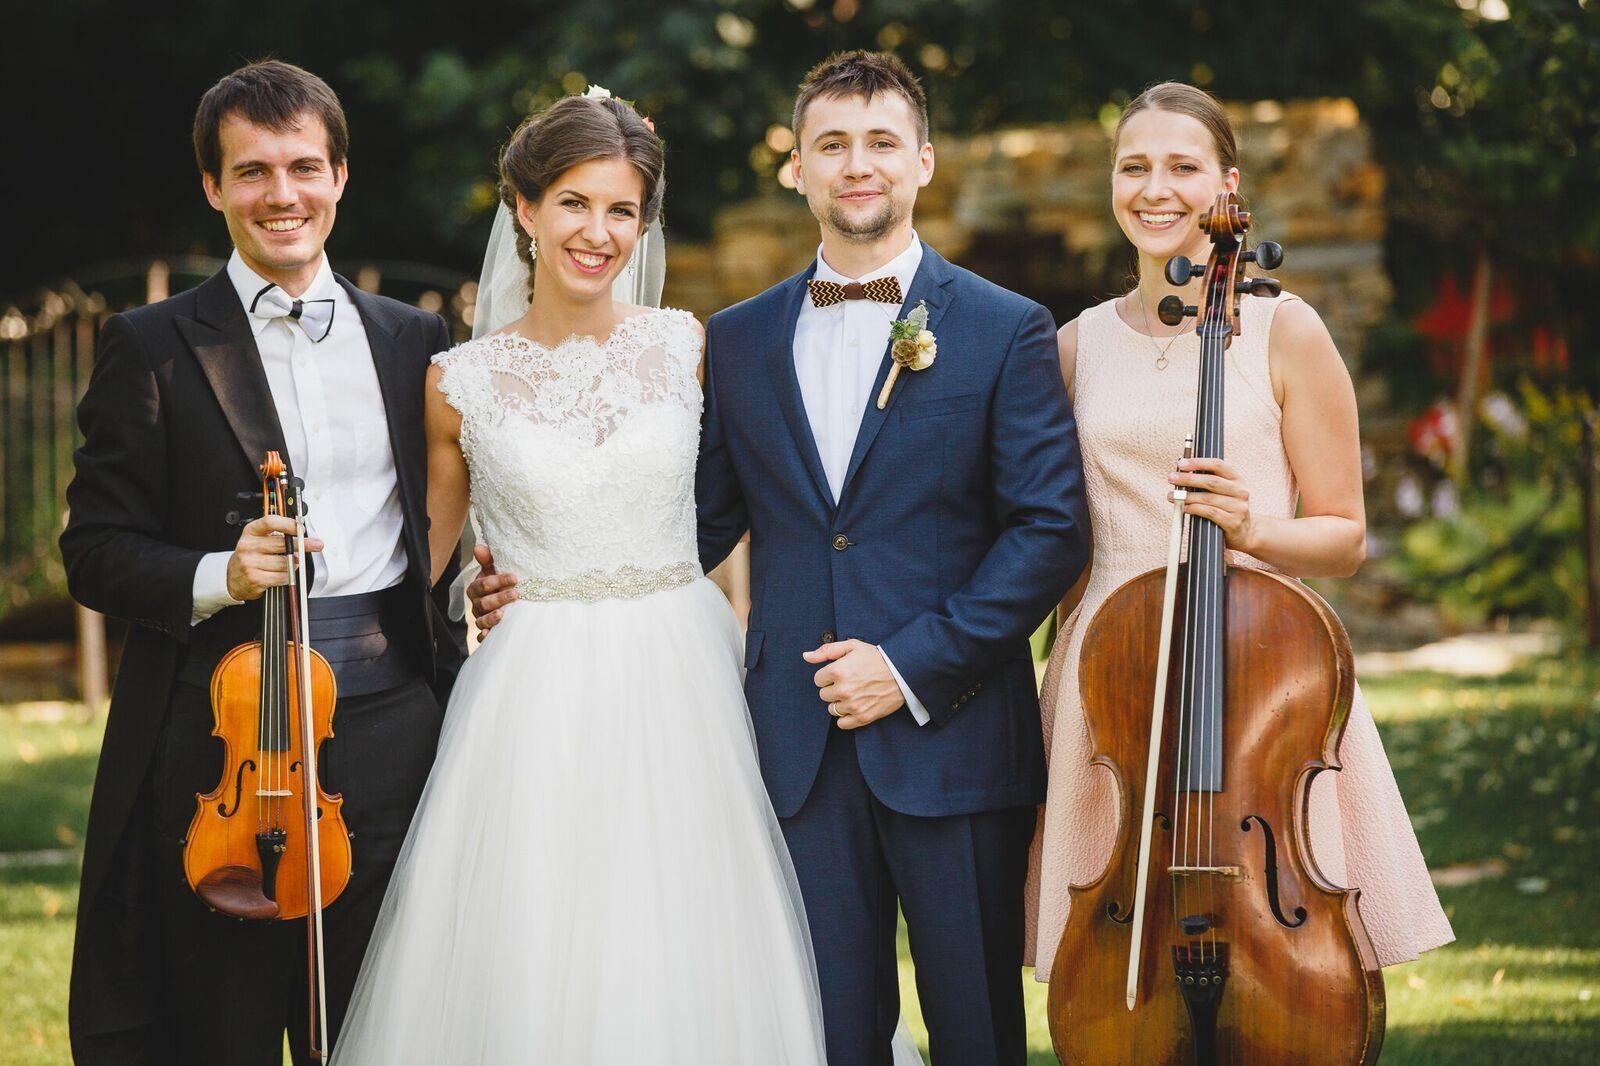 svadobne_kvarteto - Obrázok č. 3